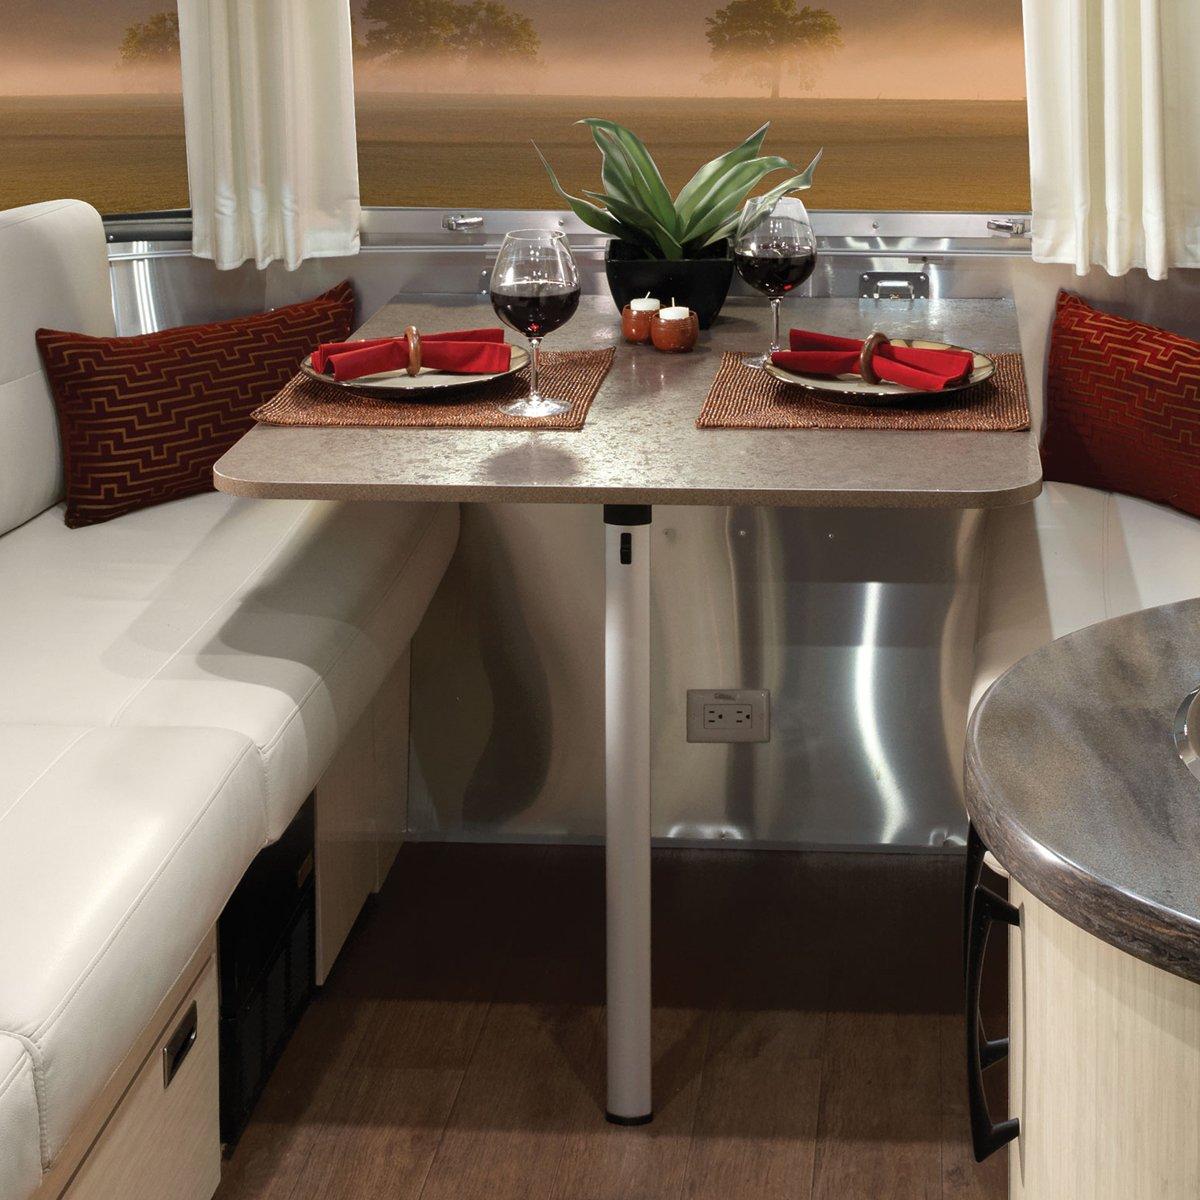 21 Best Counter Across Low Window Images On Pinterest: International Serenity 25RB Floor Plan